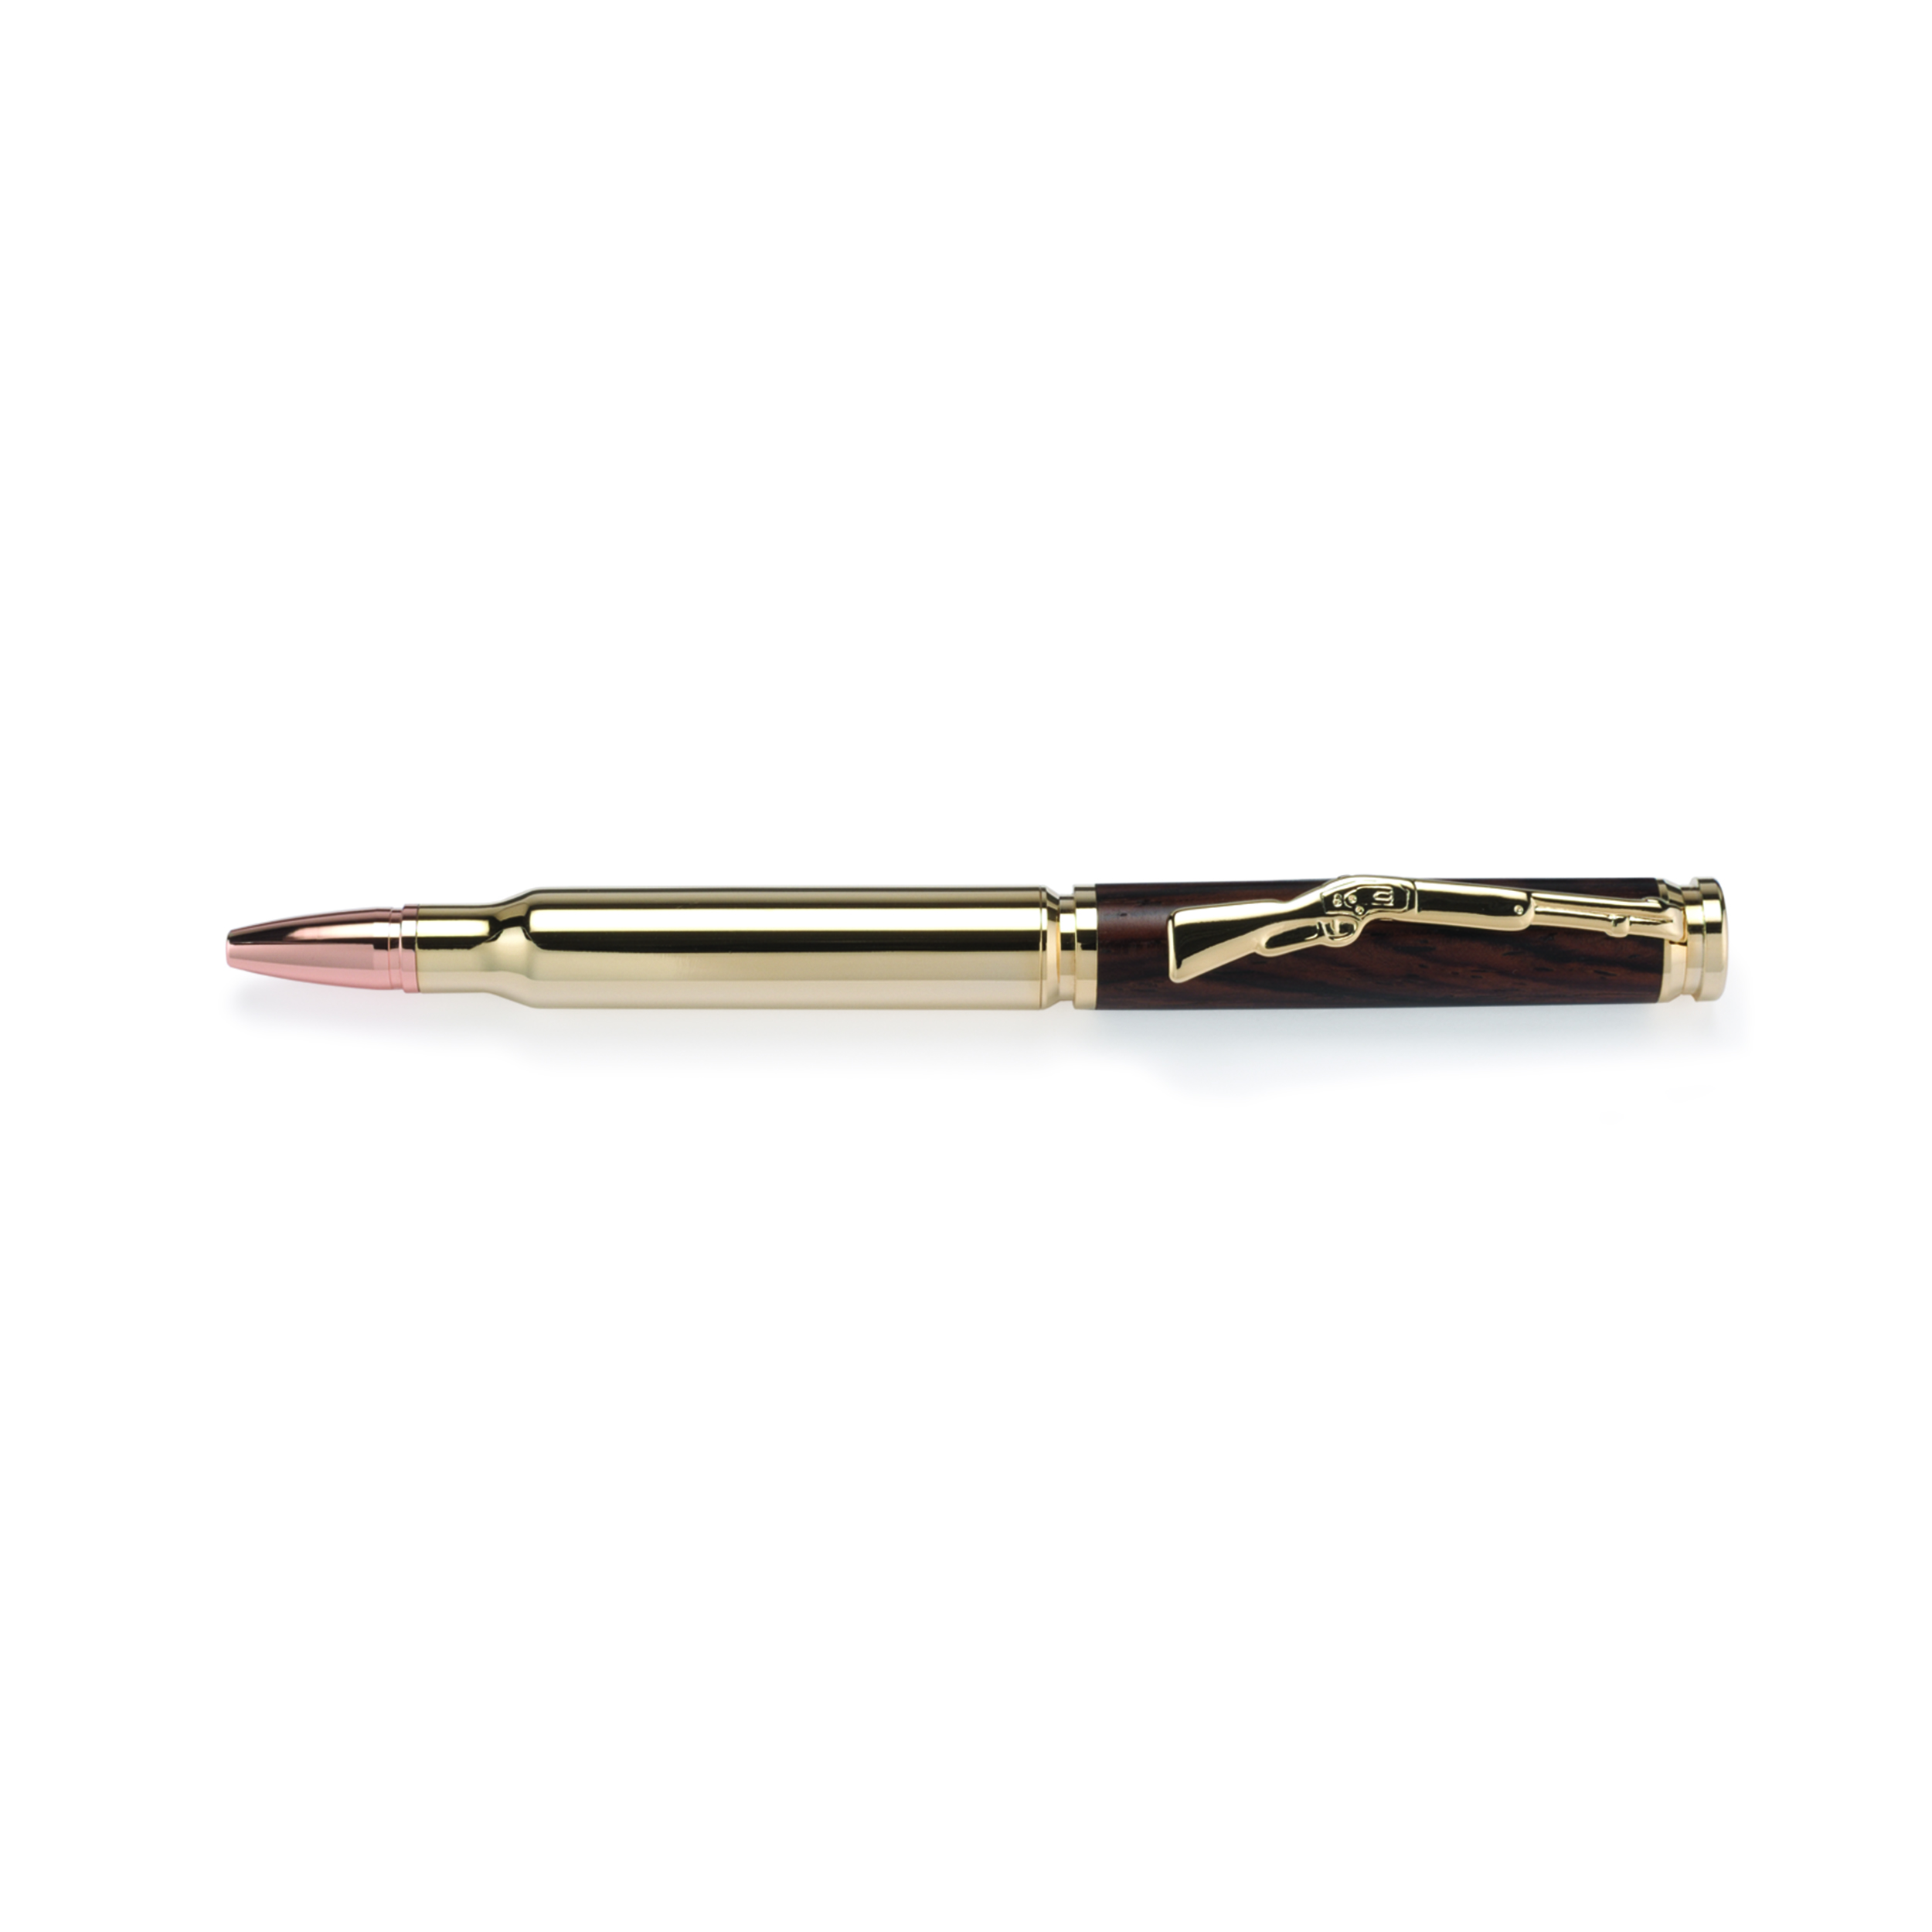 Cartridge Bullet Ballpoint Pen Kit - Woodcraft Gold